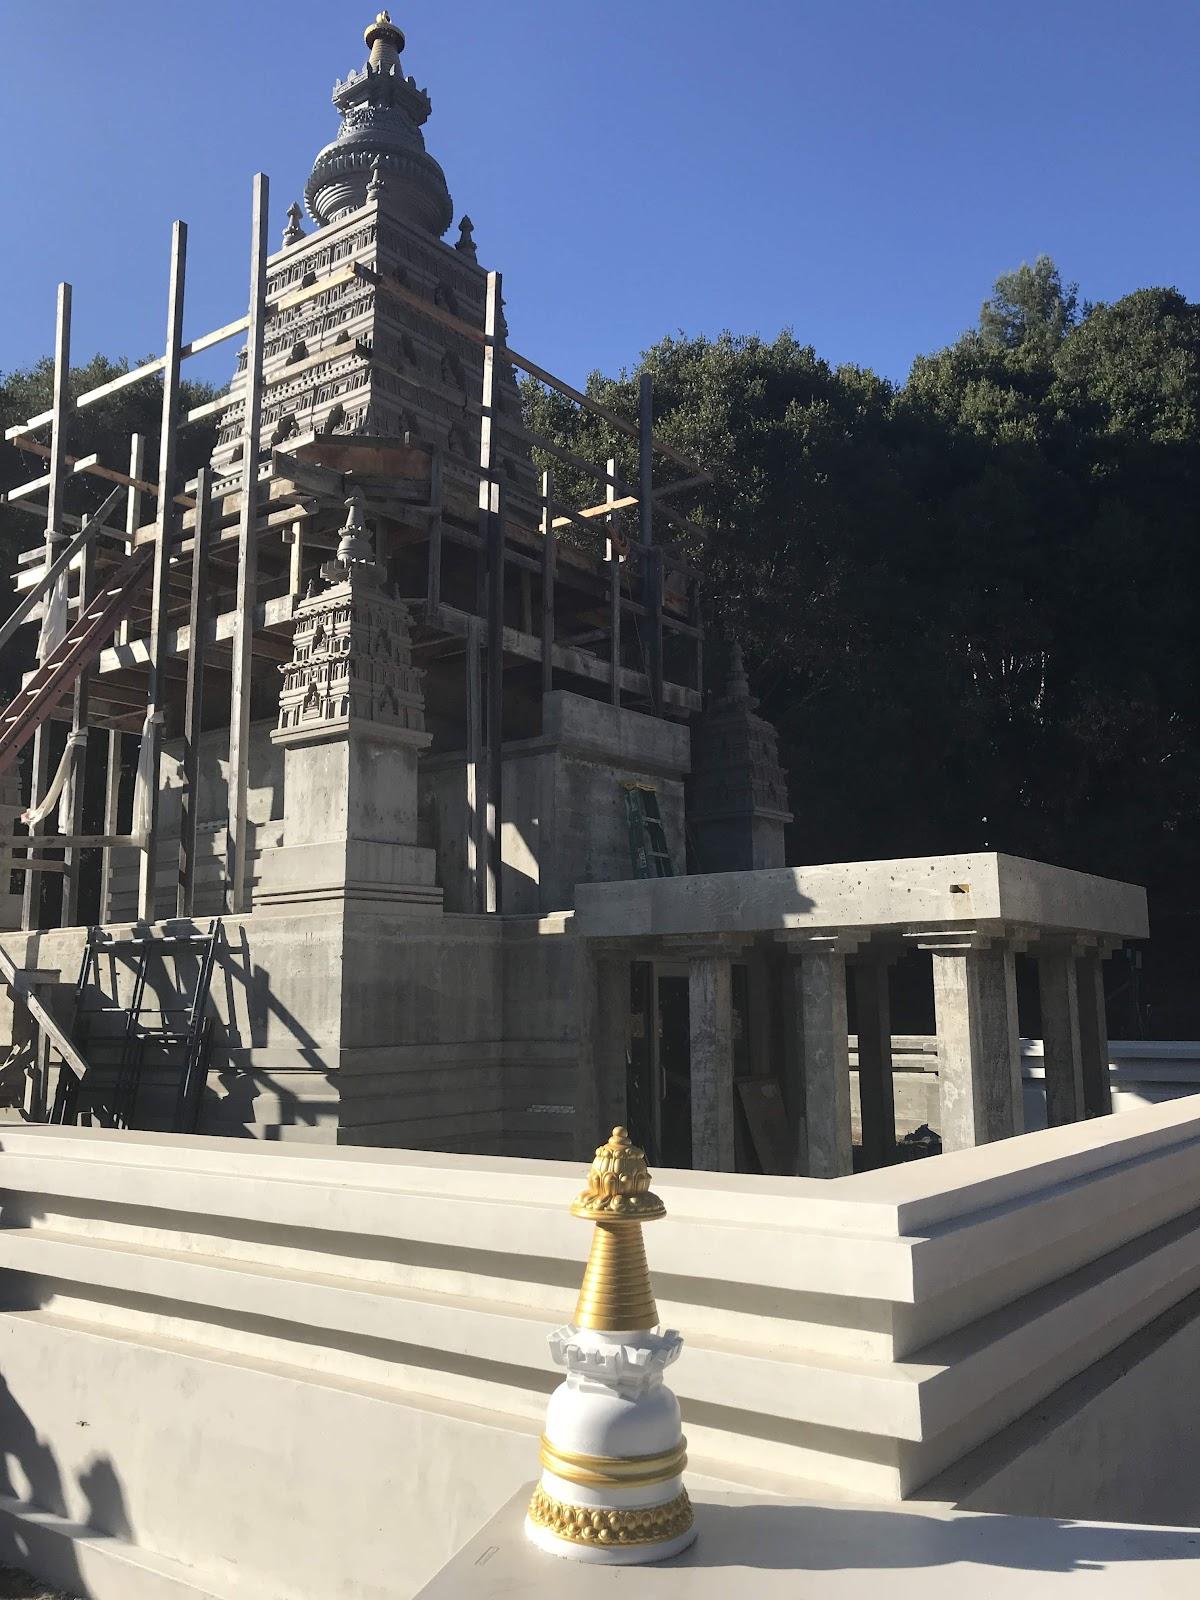 Progress on the Mahabodhi Stupa and Land of Medicine Buddha, Soquel, CA, US.